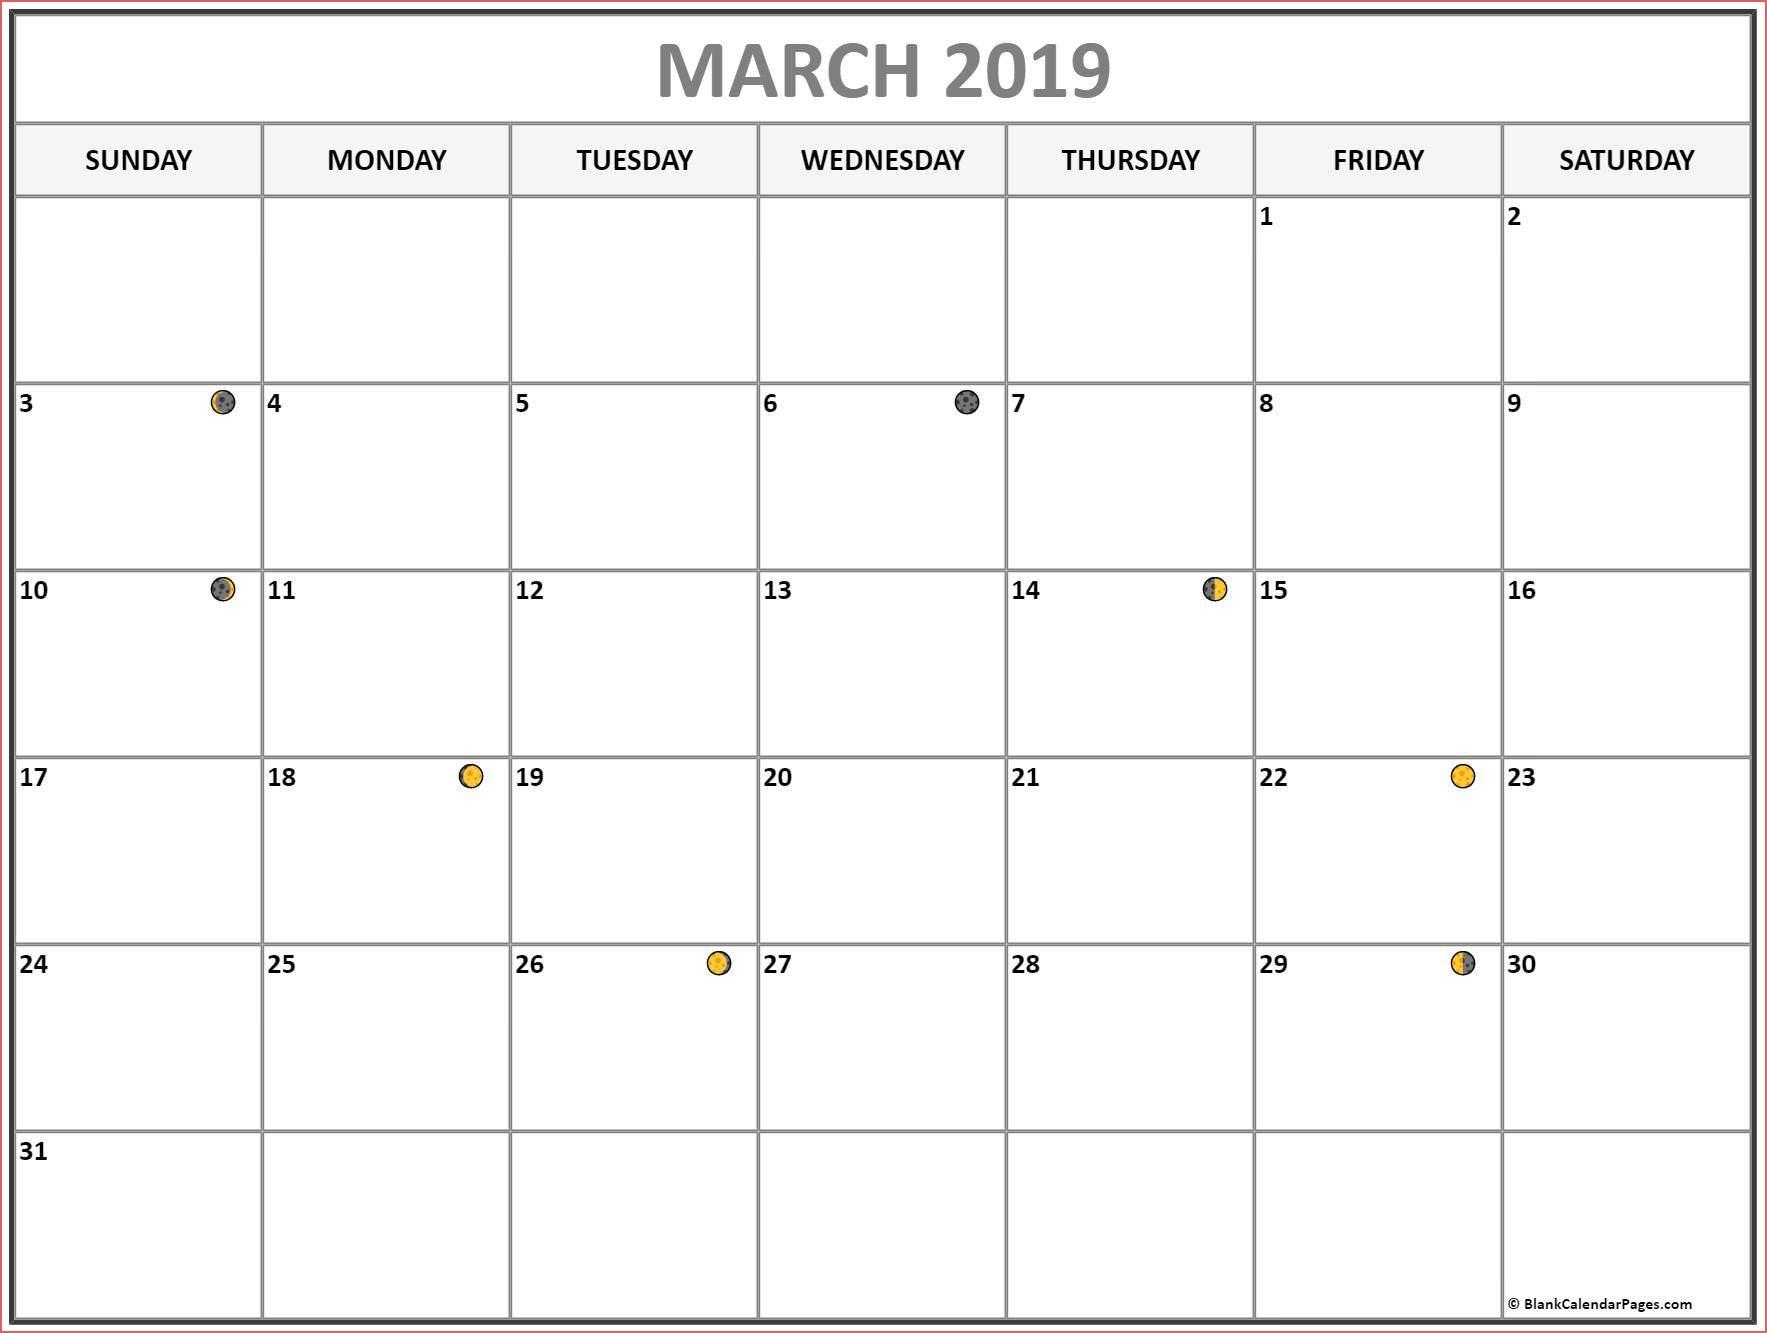 Moon Phase Calendar March 2019 Www Bilderbeste Com Moon Phases Calendar 2019 With Moon Phases